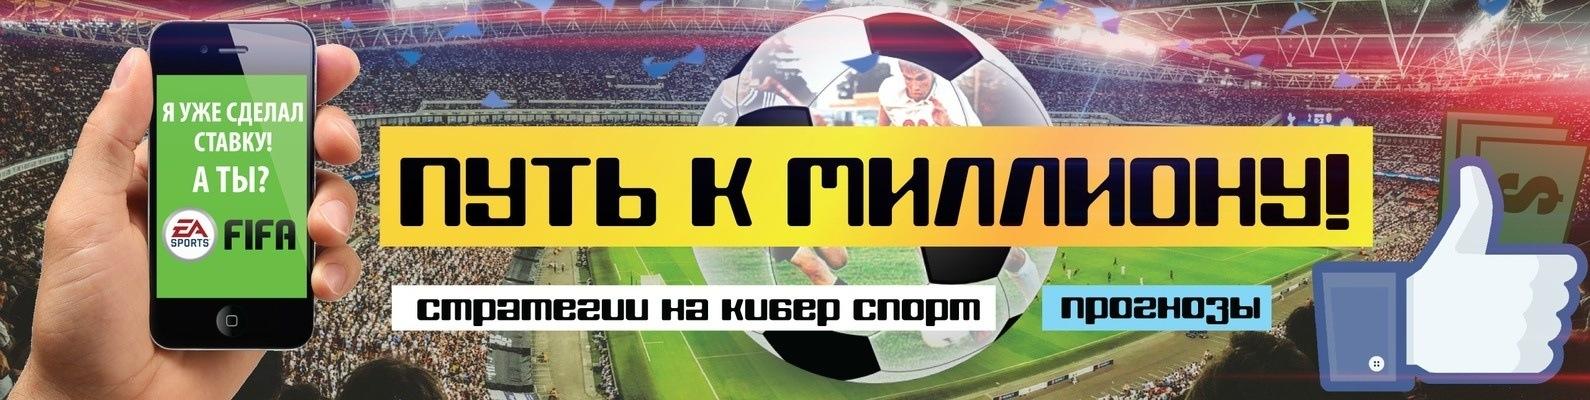 Кибер футбол fifa 17 прогнозы